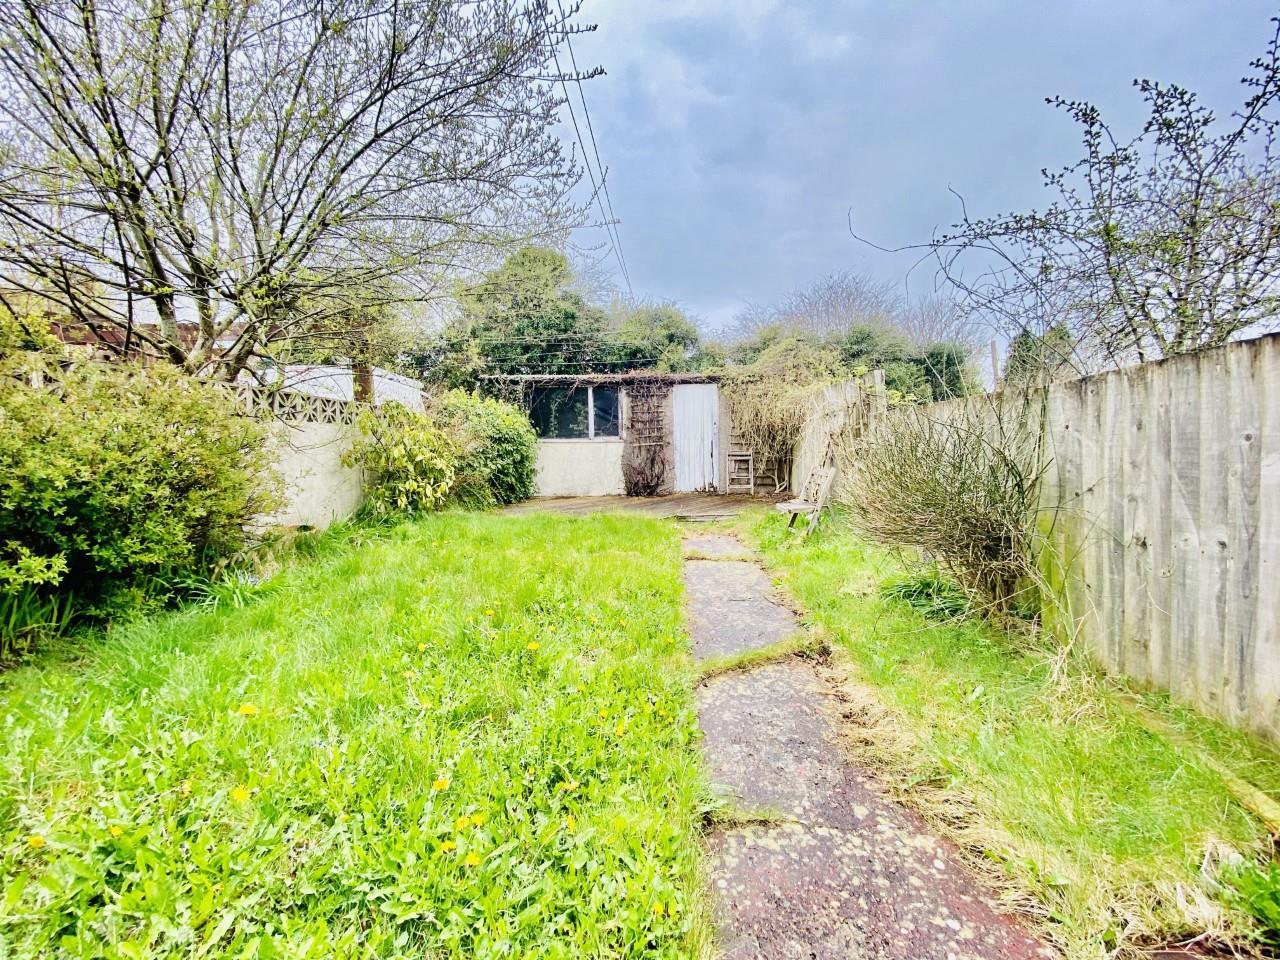 Killan Road, Dunvant, Swansea, SA2 7TH